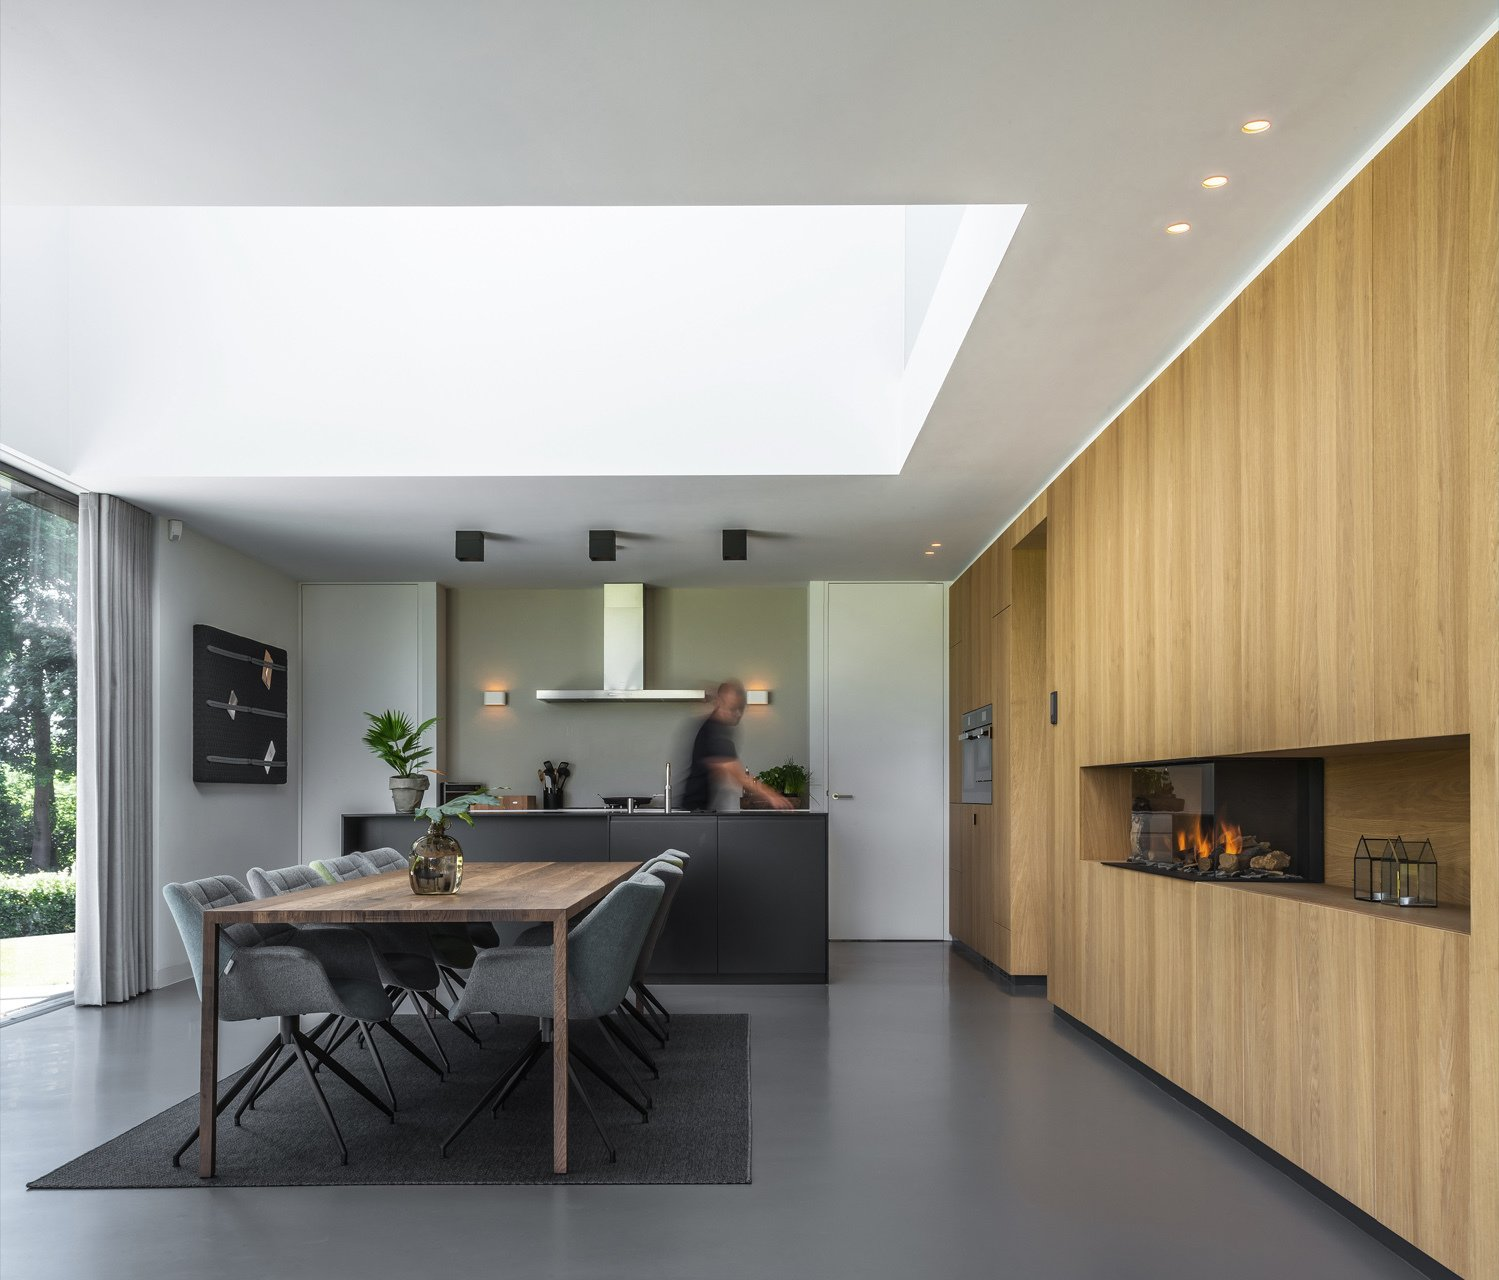 Kitchen, Concrete, Wall Oven, Wood, Wall, Ceiling, and Metal  Best Kitchen Concrete Wood Wall Photos from Villa IJsselzig